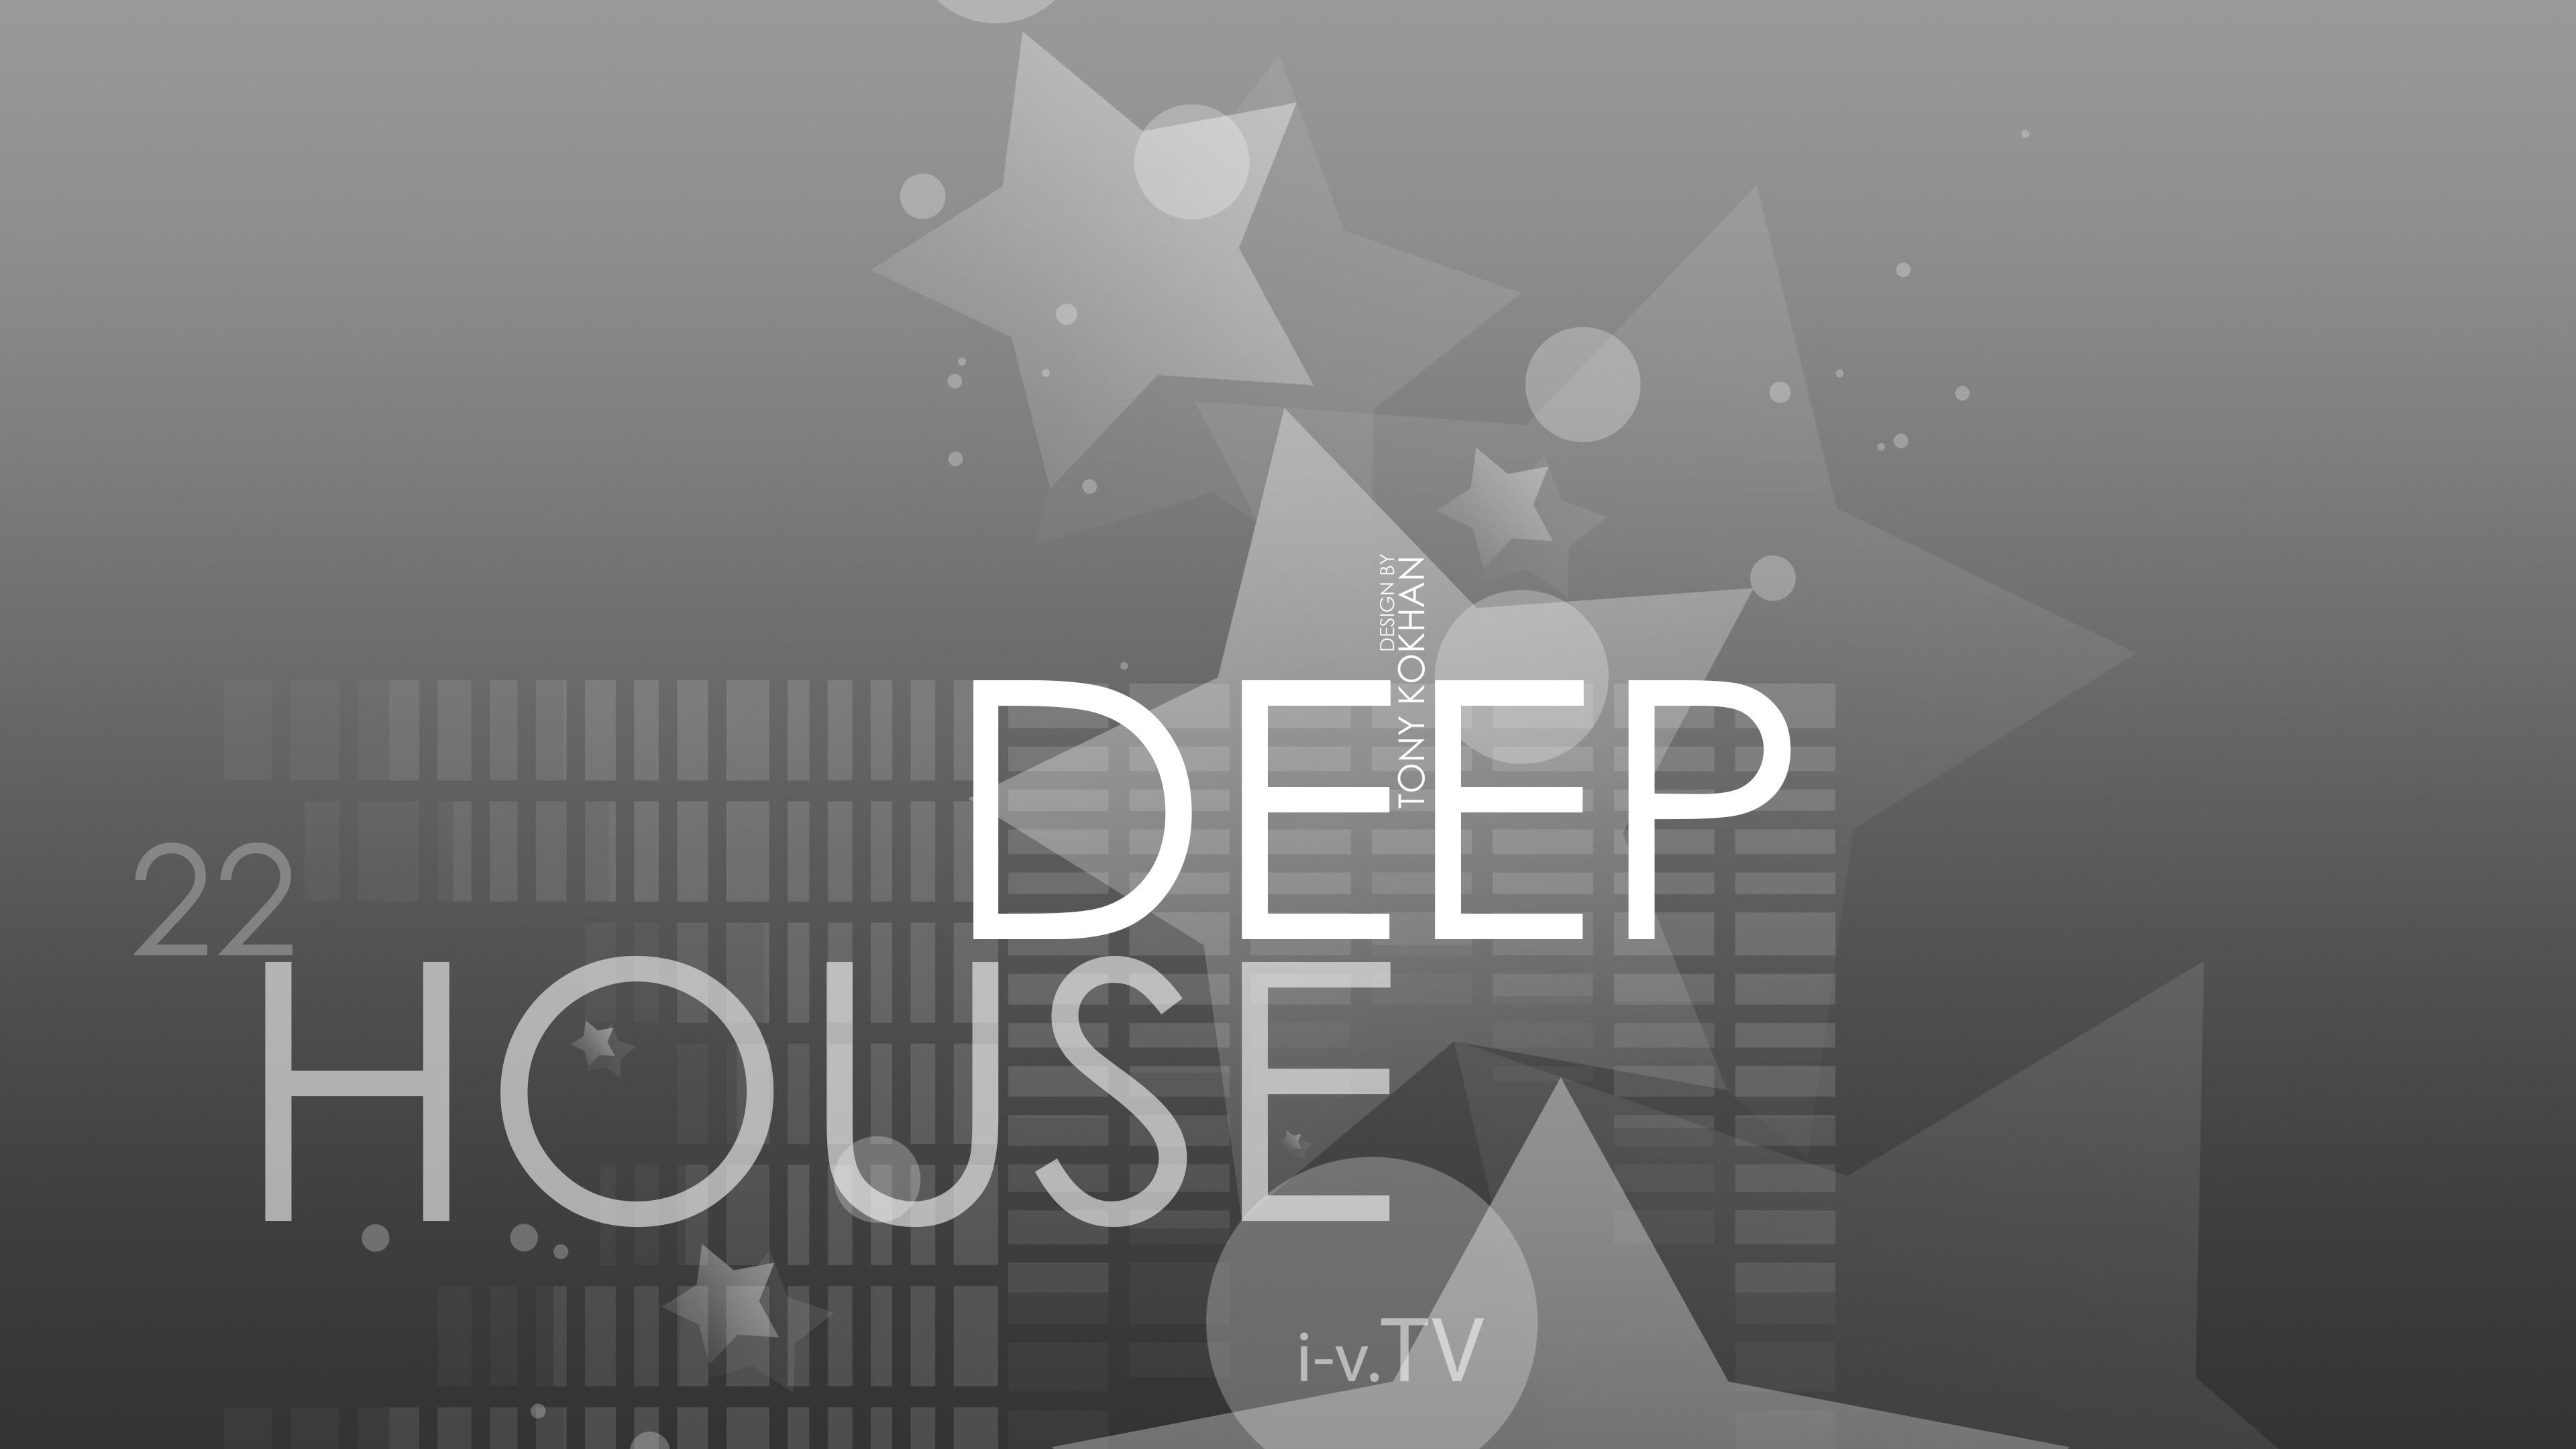 Deep House Music eQ SC Twenty Two Abstract Words 2015 Tony 3840x2160